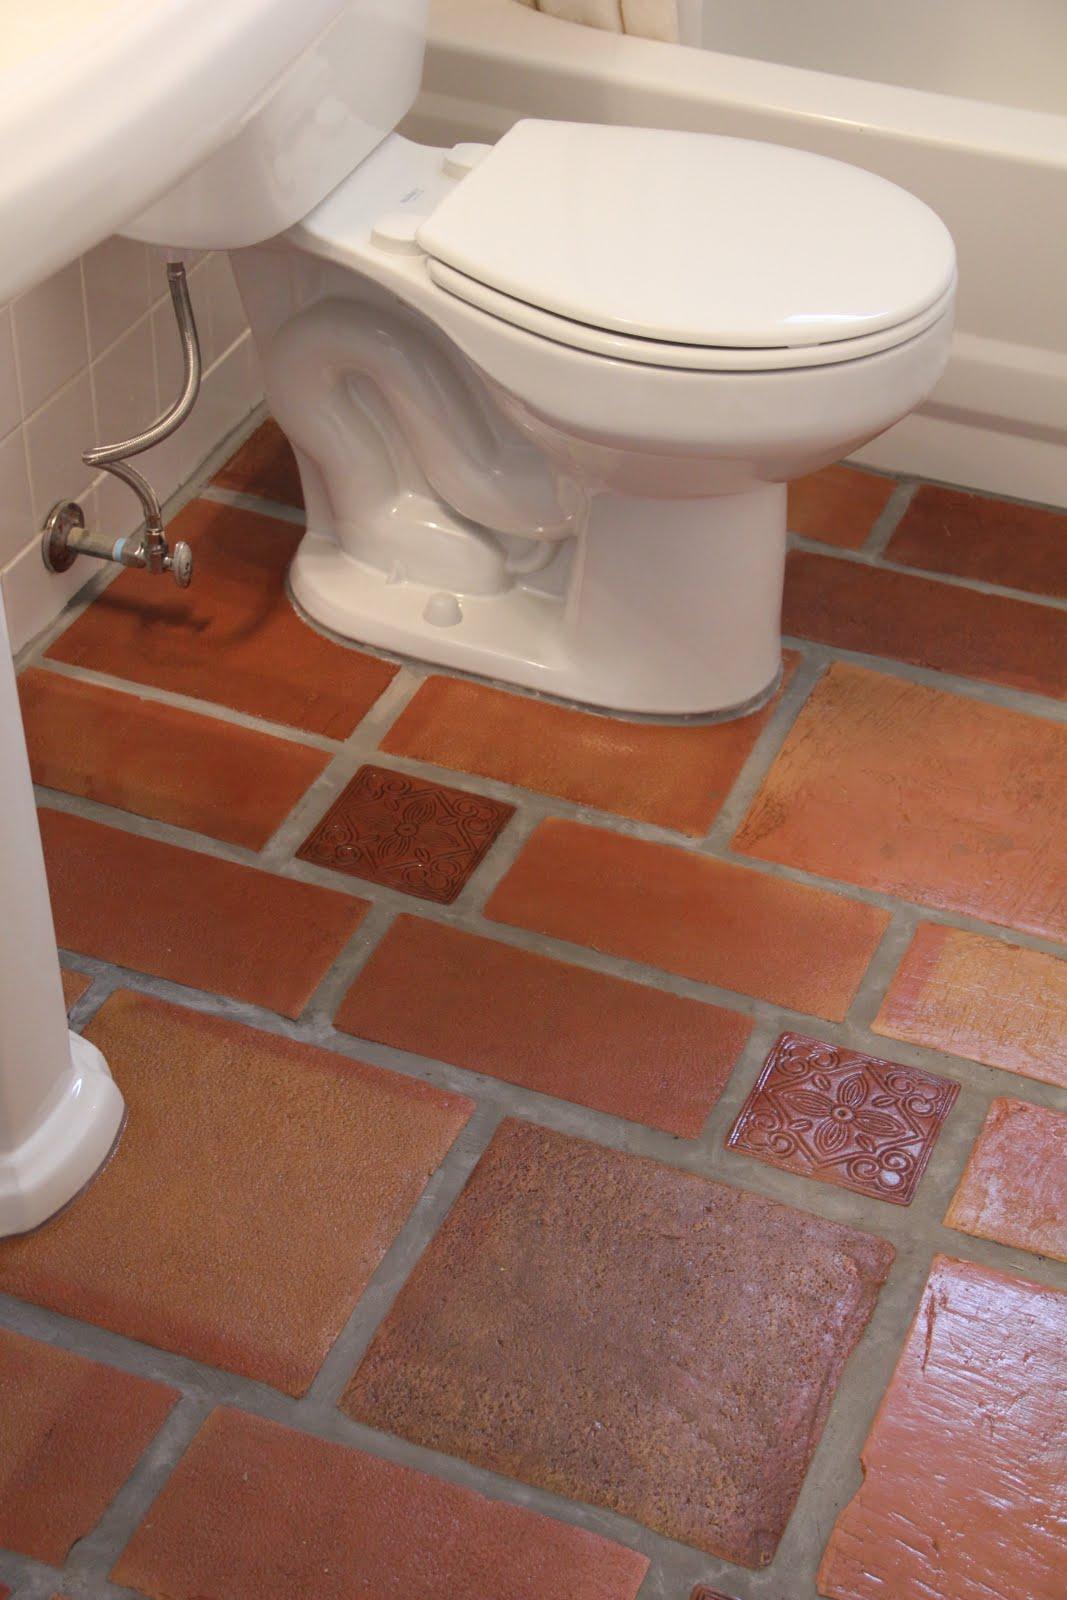 2 Square Bathroom Floor Tiles in Pakistan Mosaic Flooring Tiles Design Images.